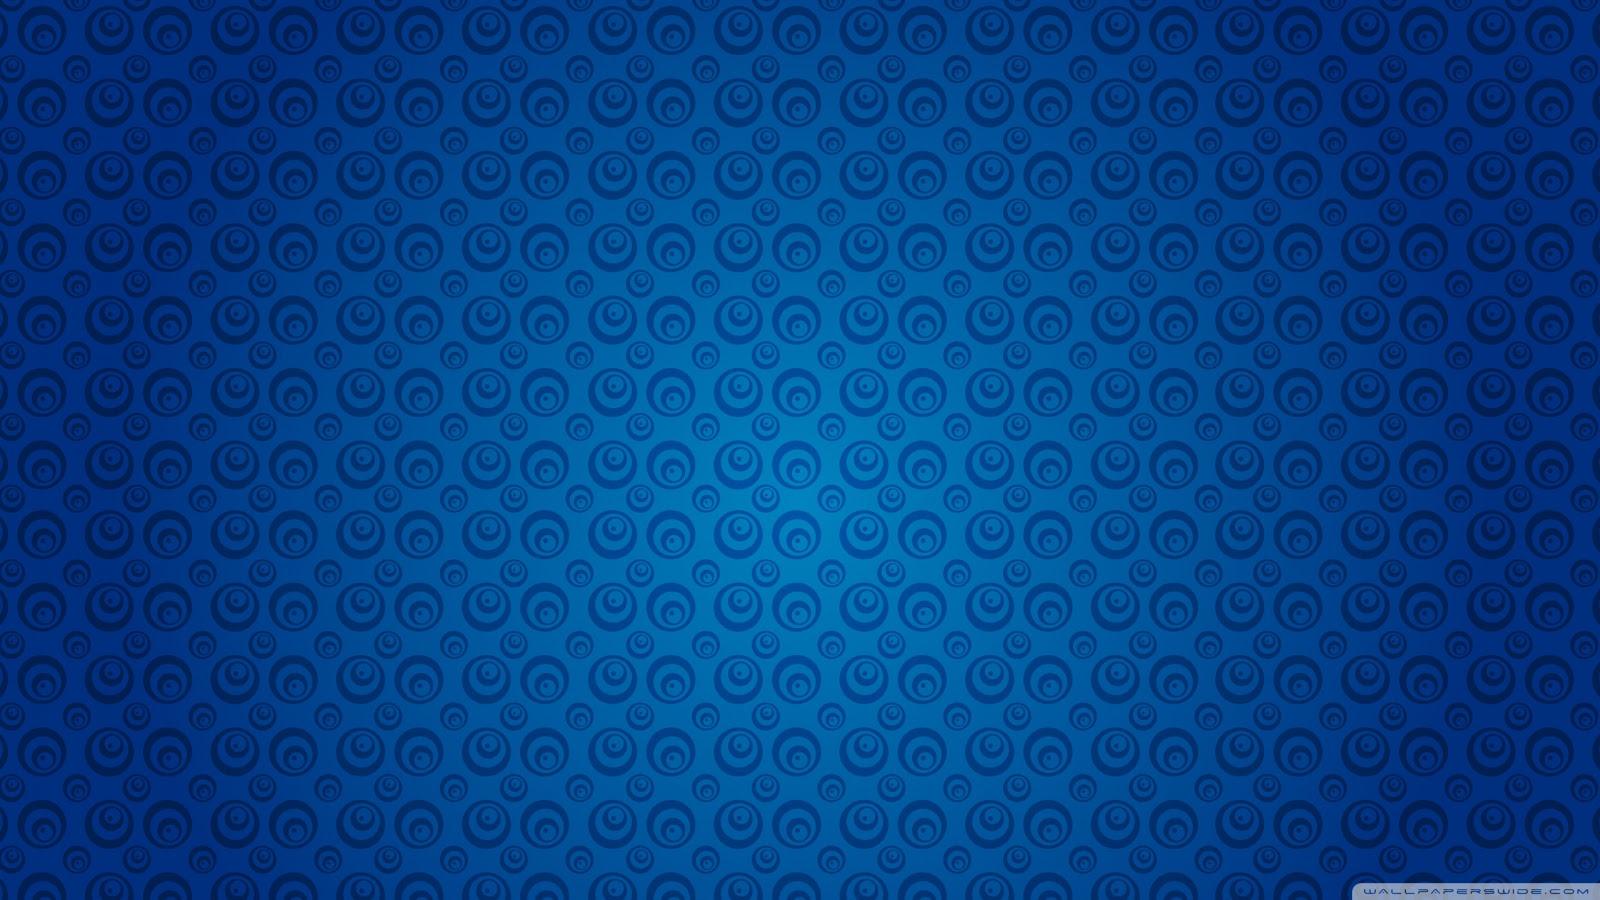 Unduh 6800 Koleksi Wallpaper Hd Retro HD Paling Keren